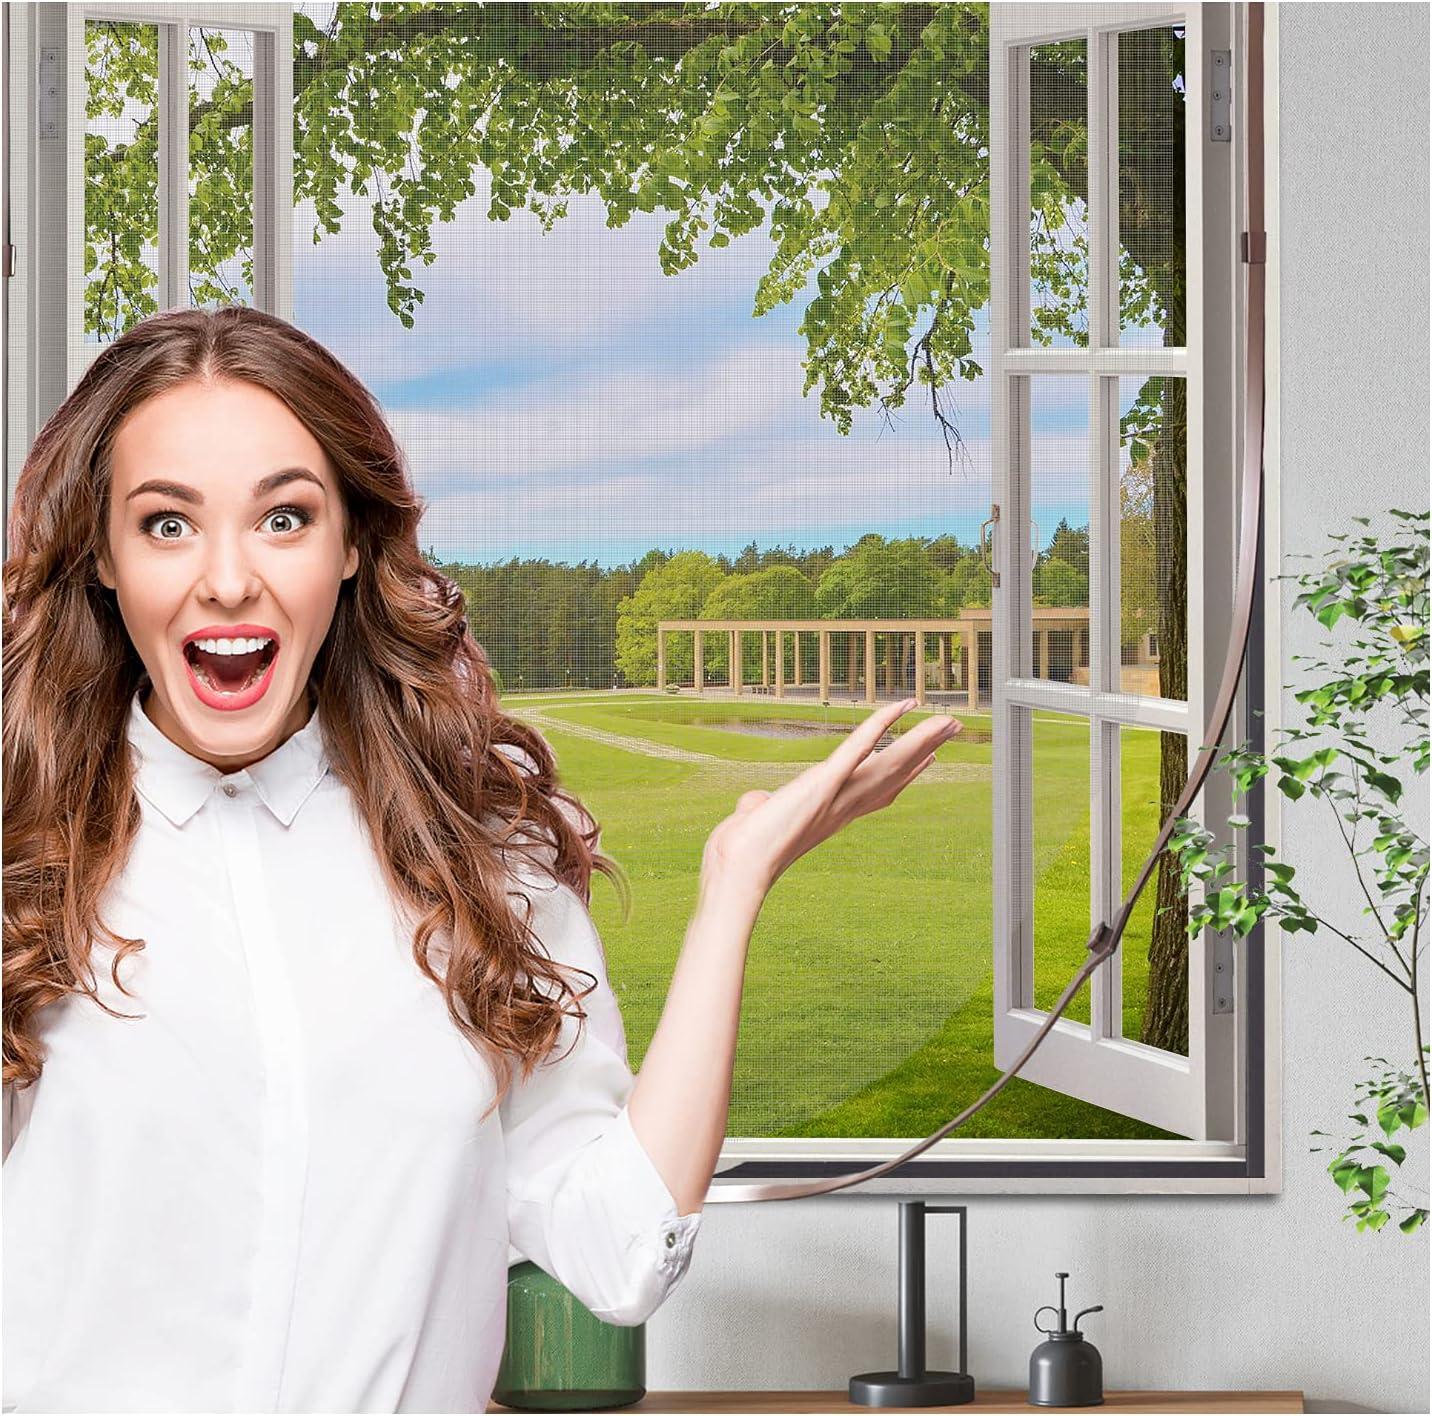 Window Screen 2021 OFFicial autumn and winter new Frame Kit Adjustable DIY Fiberglass Fireproof Mes